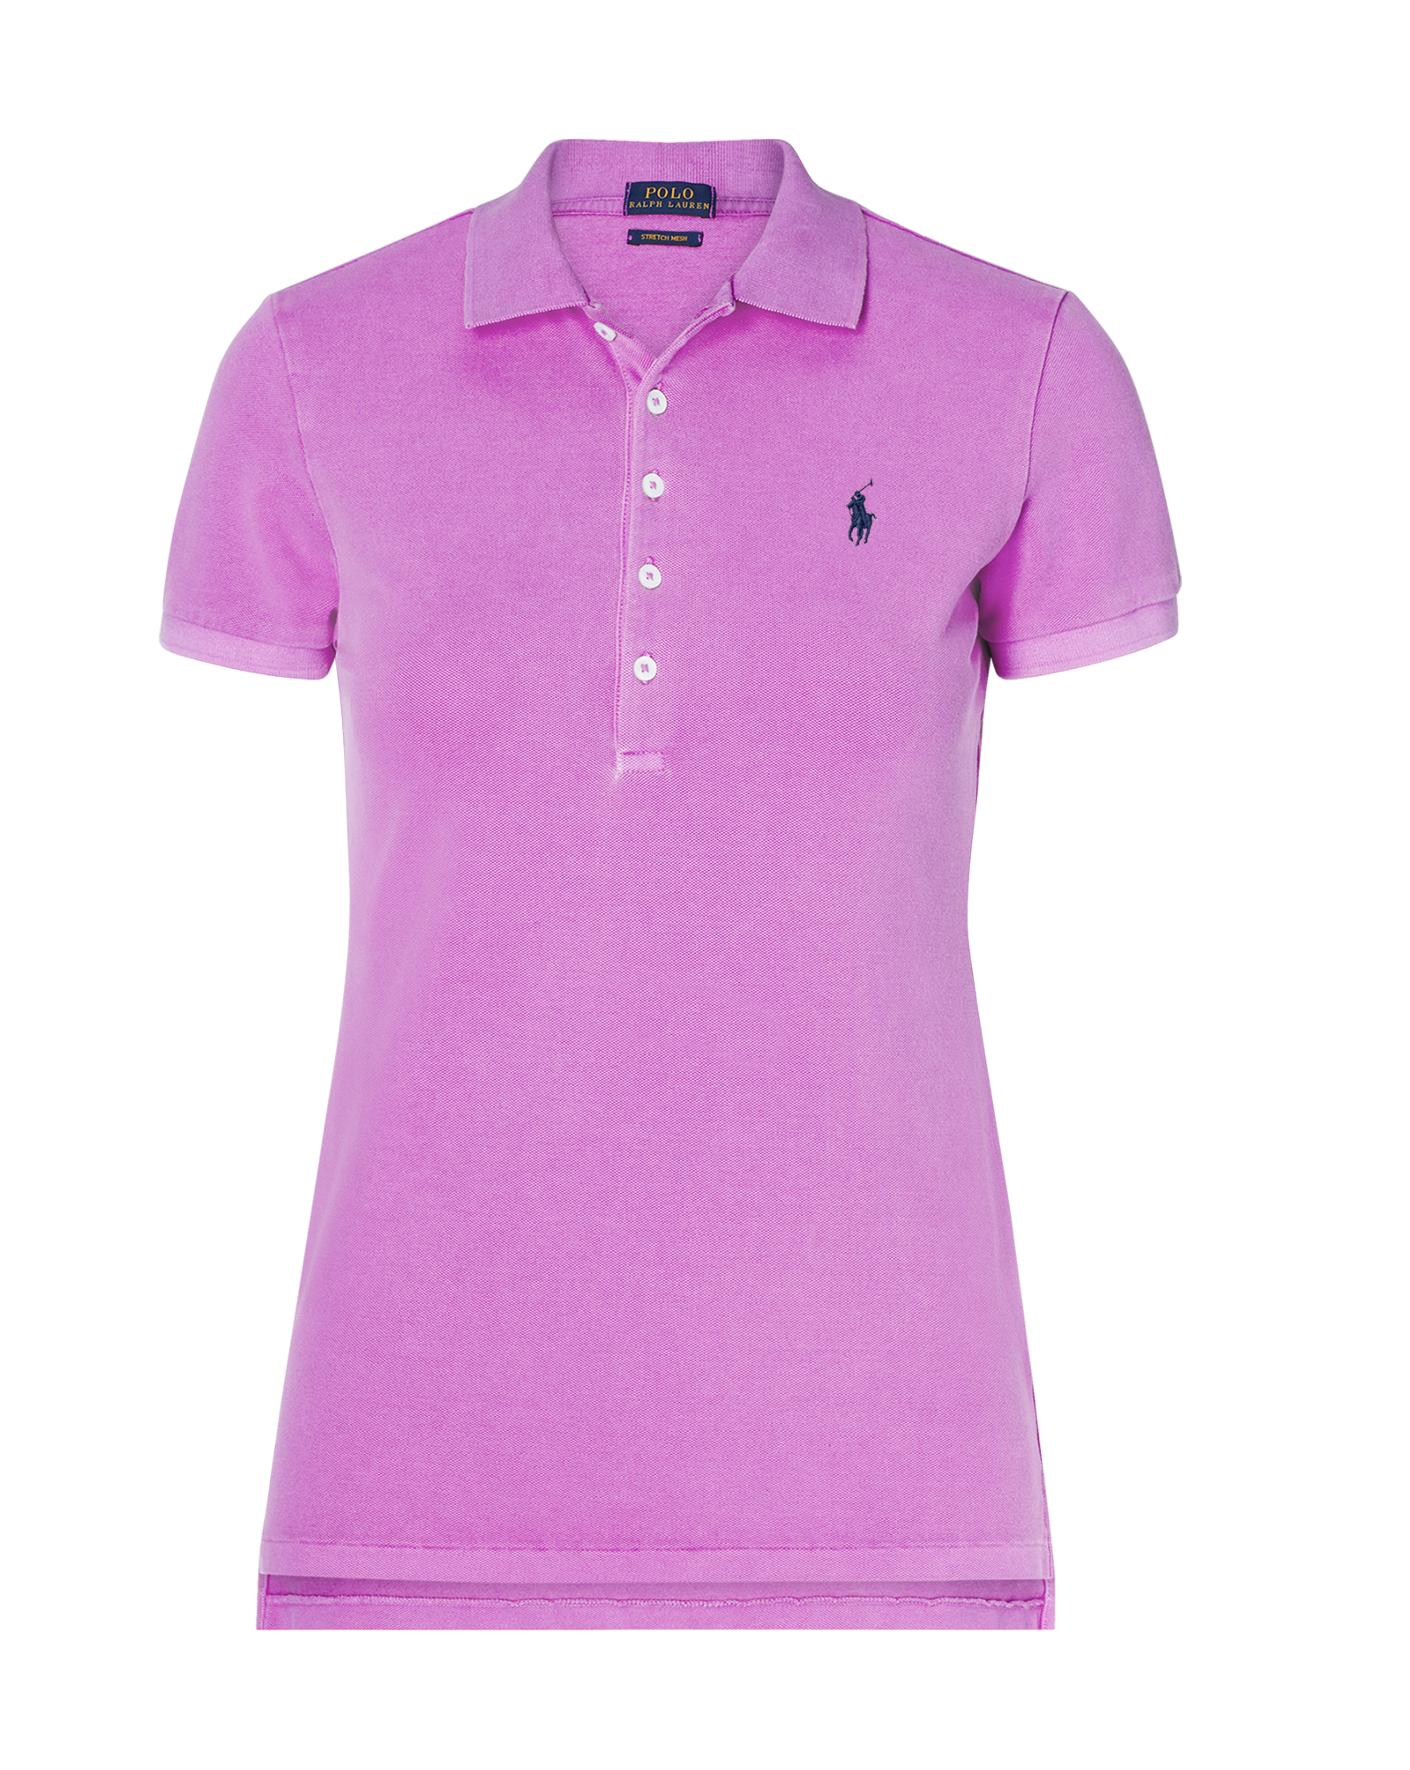 Women's Polo Shirts & Collared Shirts | Polo Ralph Lauren